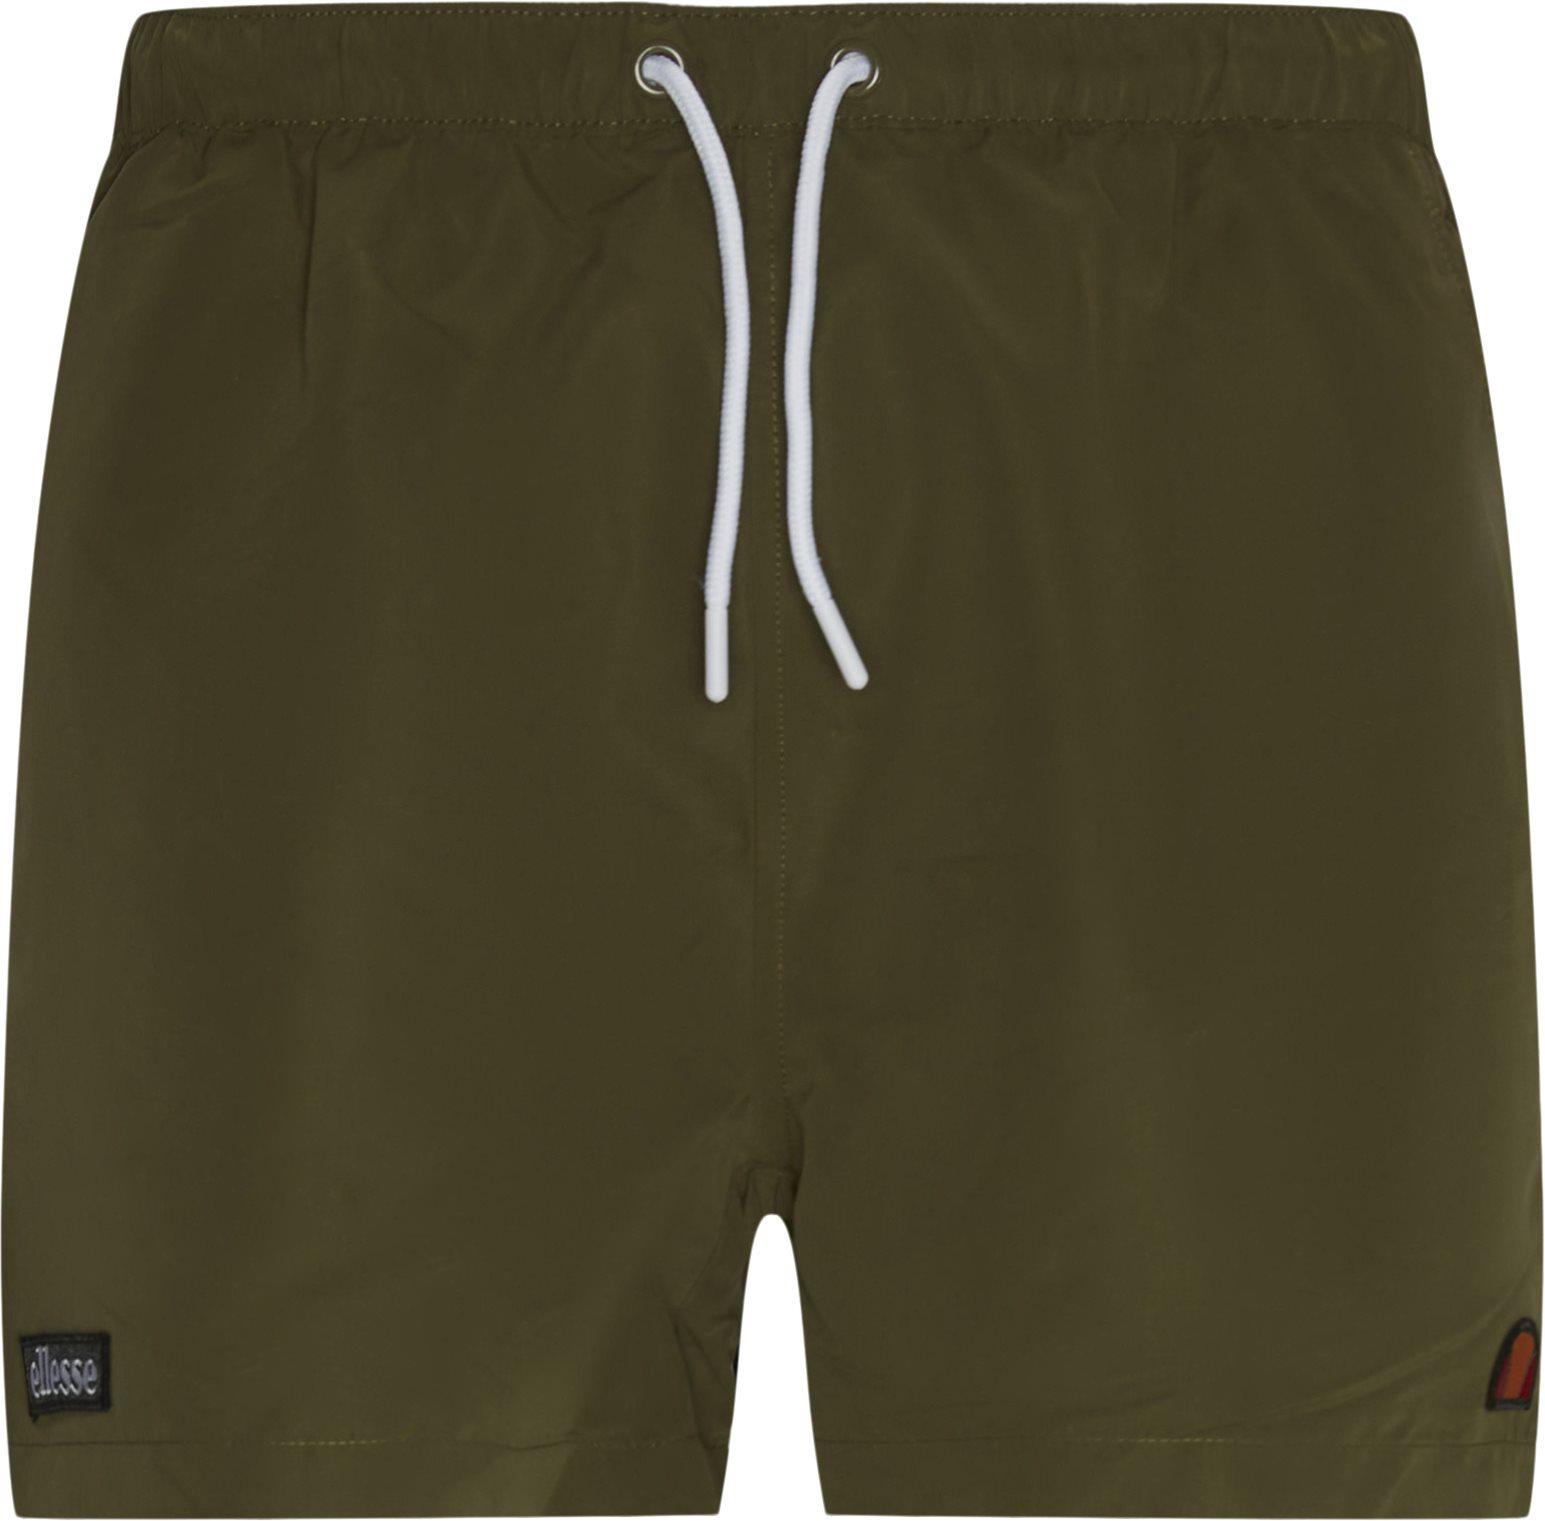 Slackers Swim Shorts - Shorts - Regular fit - Army